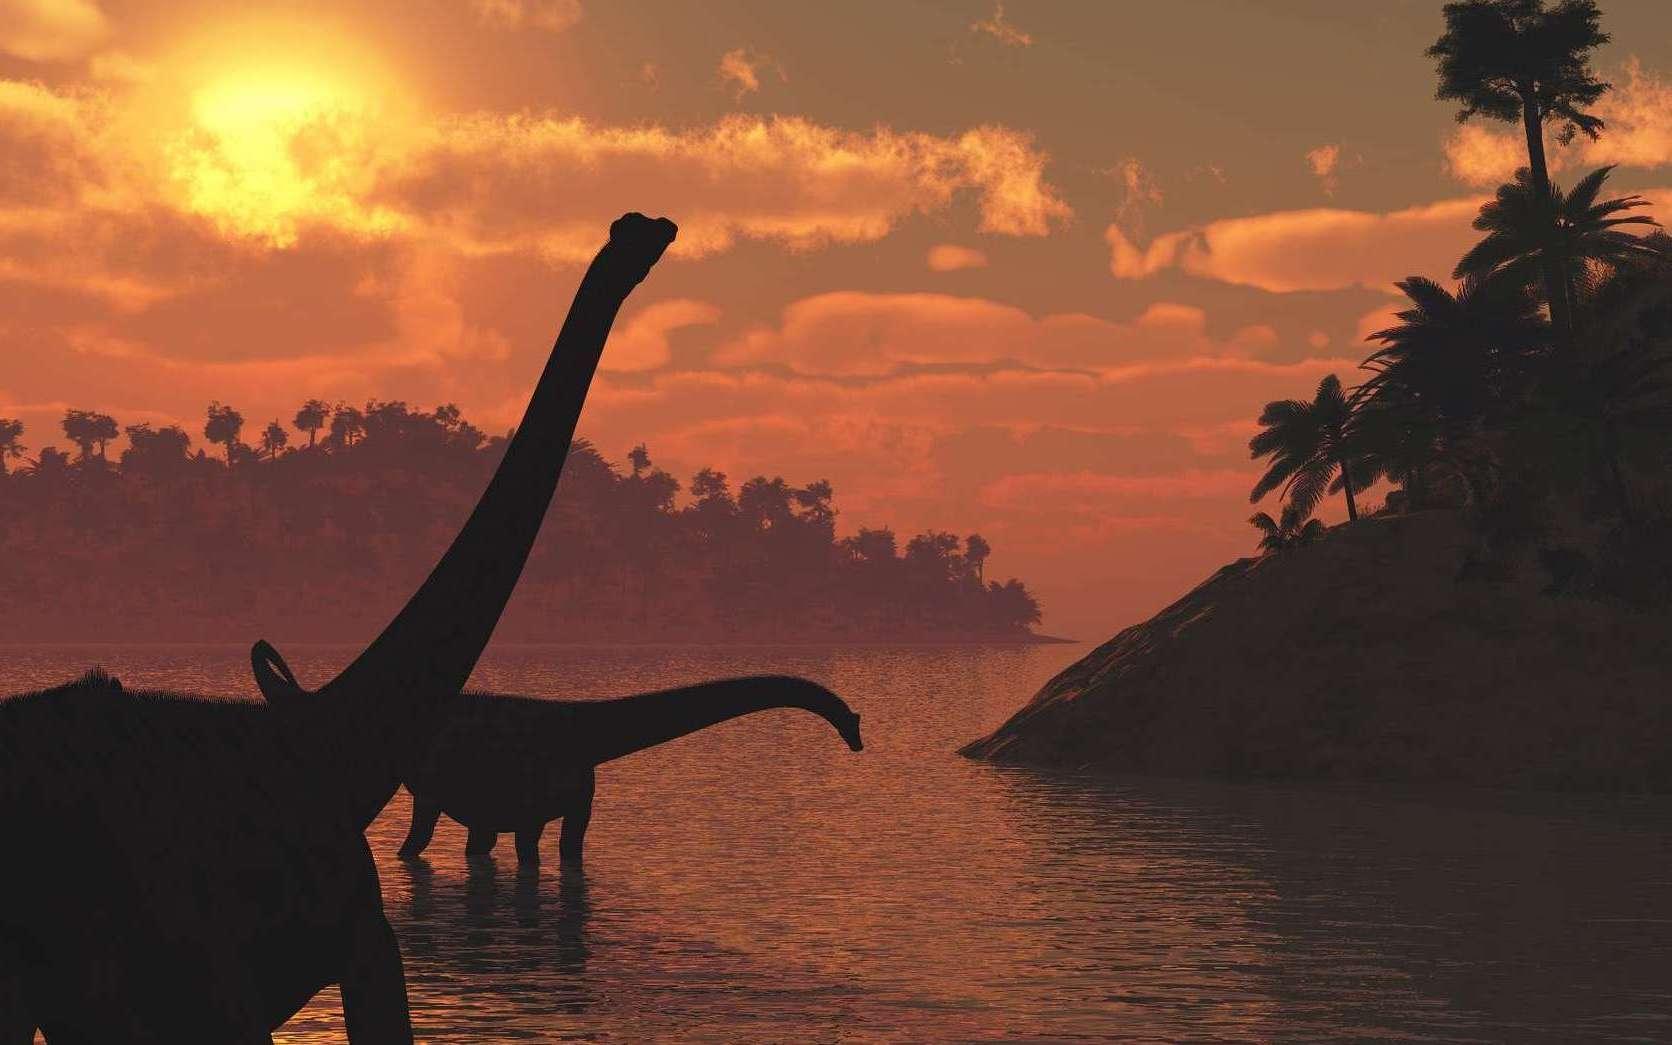 Une vue d'artiste de l'époque des dinosaures. © shutterstock, linda-bucklin